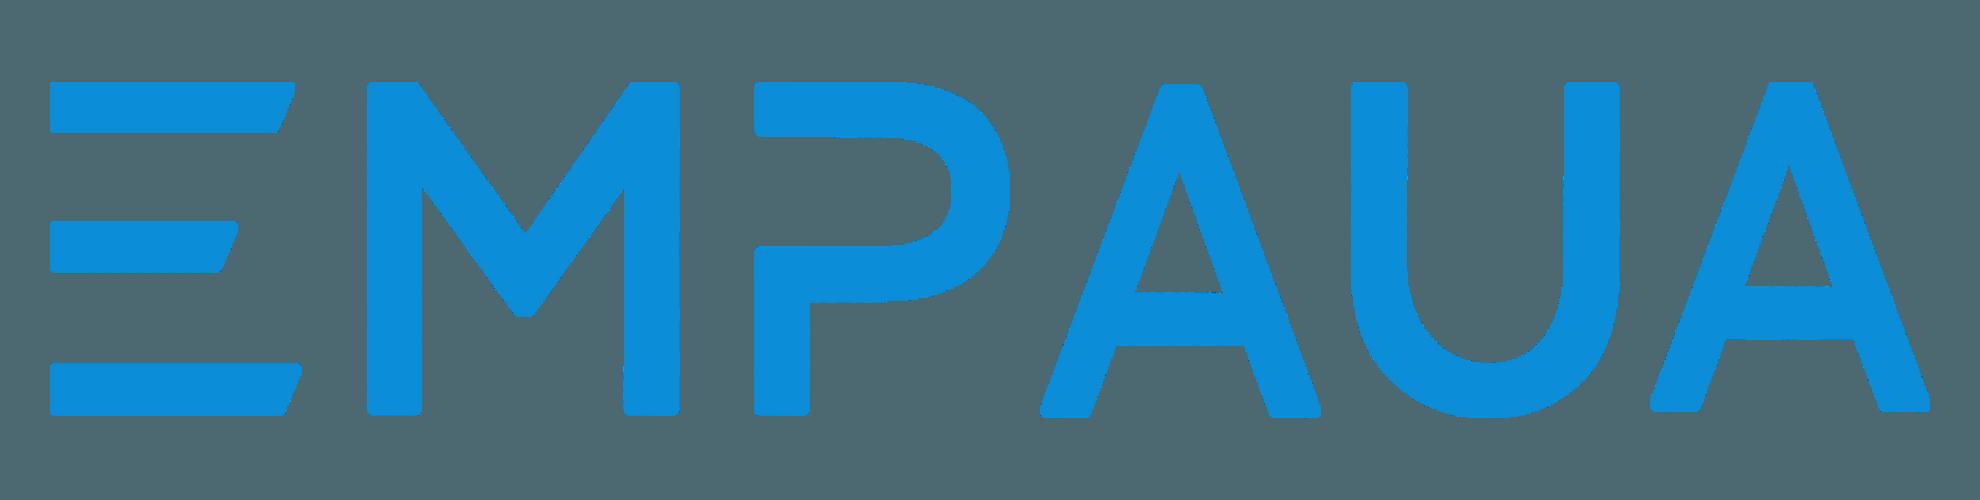 EMPAUA_logo in blue_1920x1080 px (PDF)